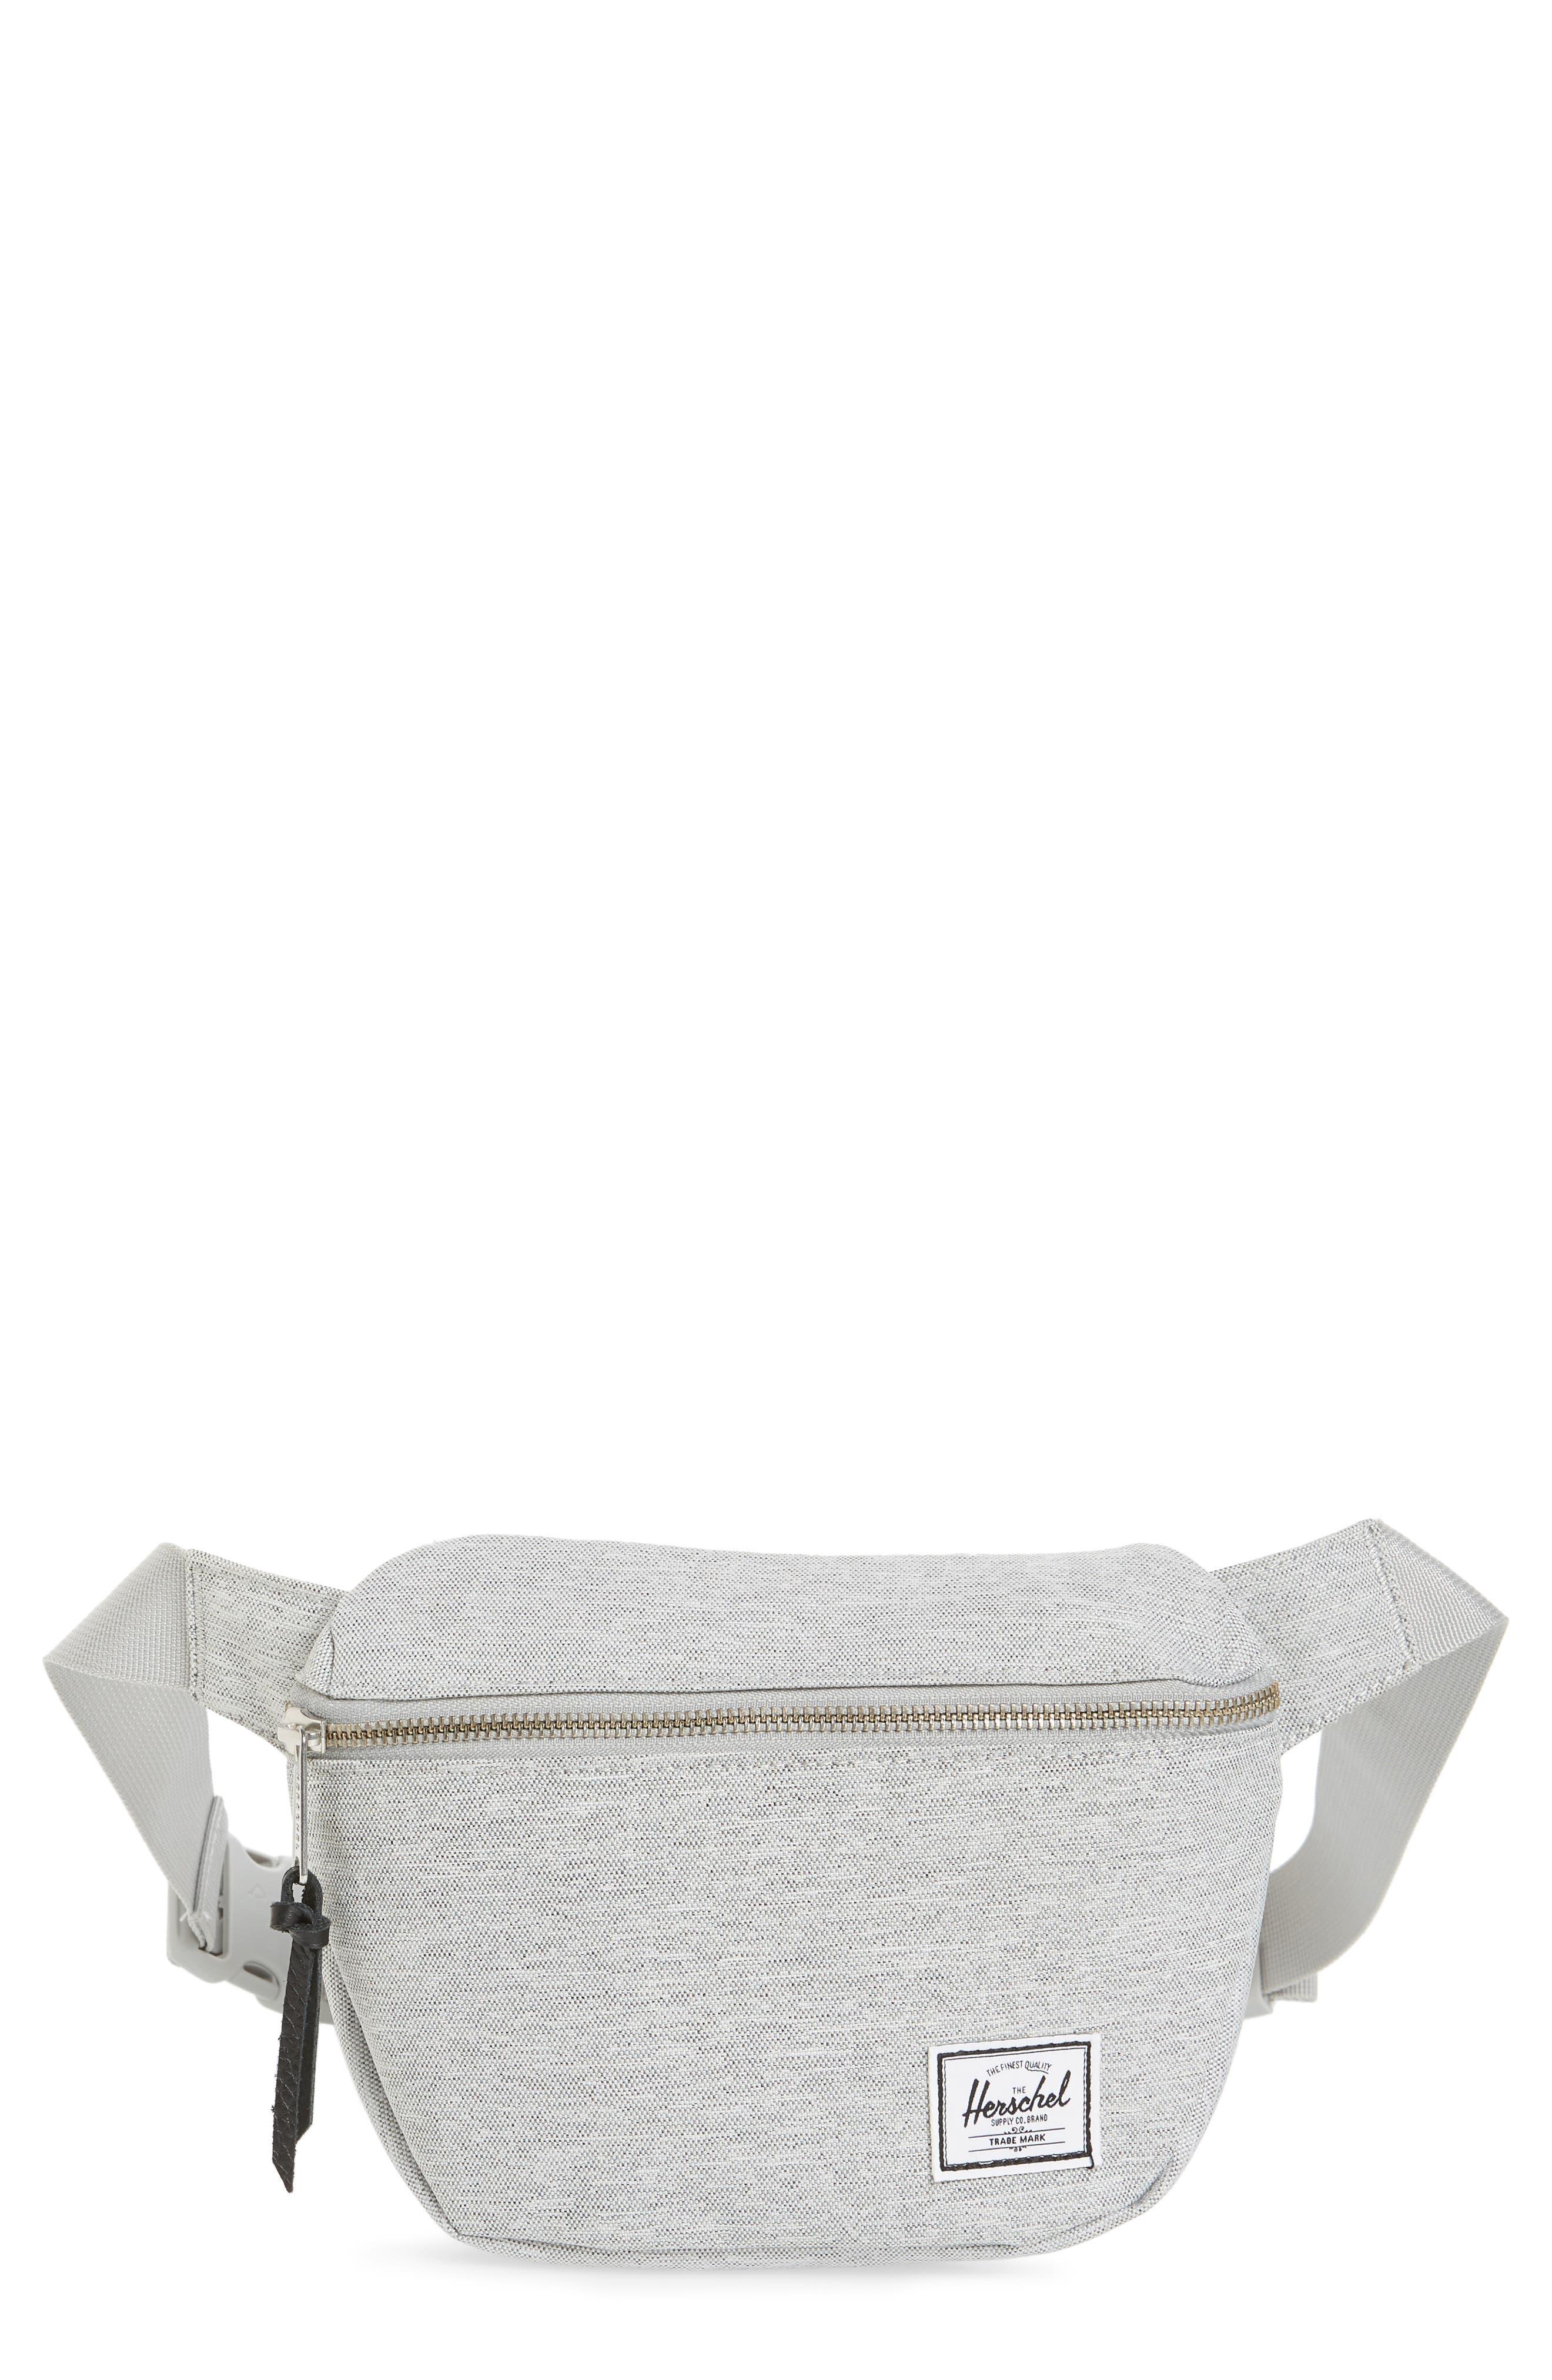 Fifteen Belt Bag,                             Main thumbnail 1, color,                             Light Grey